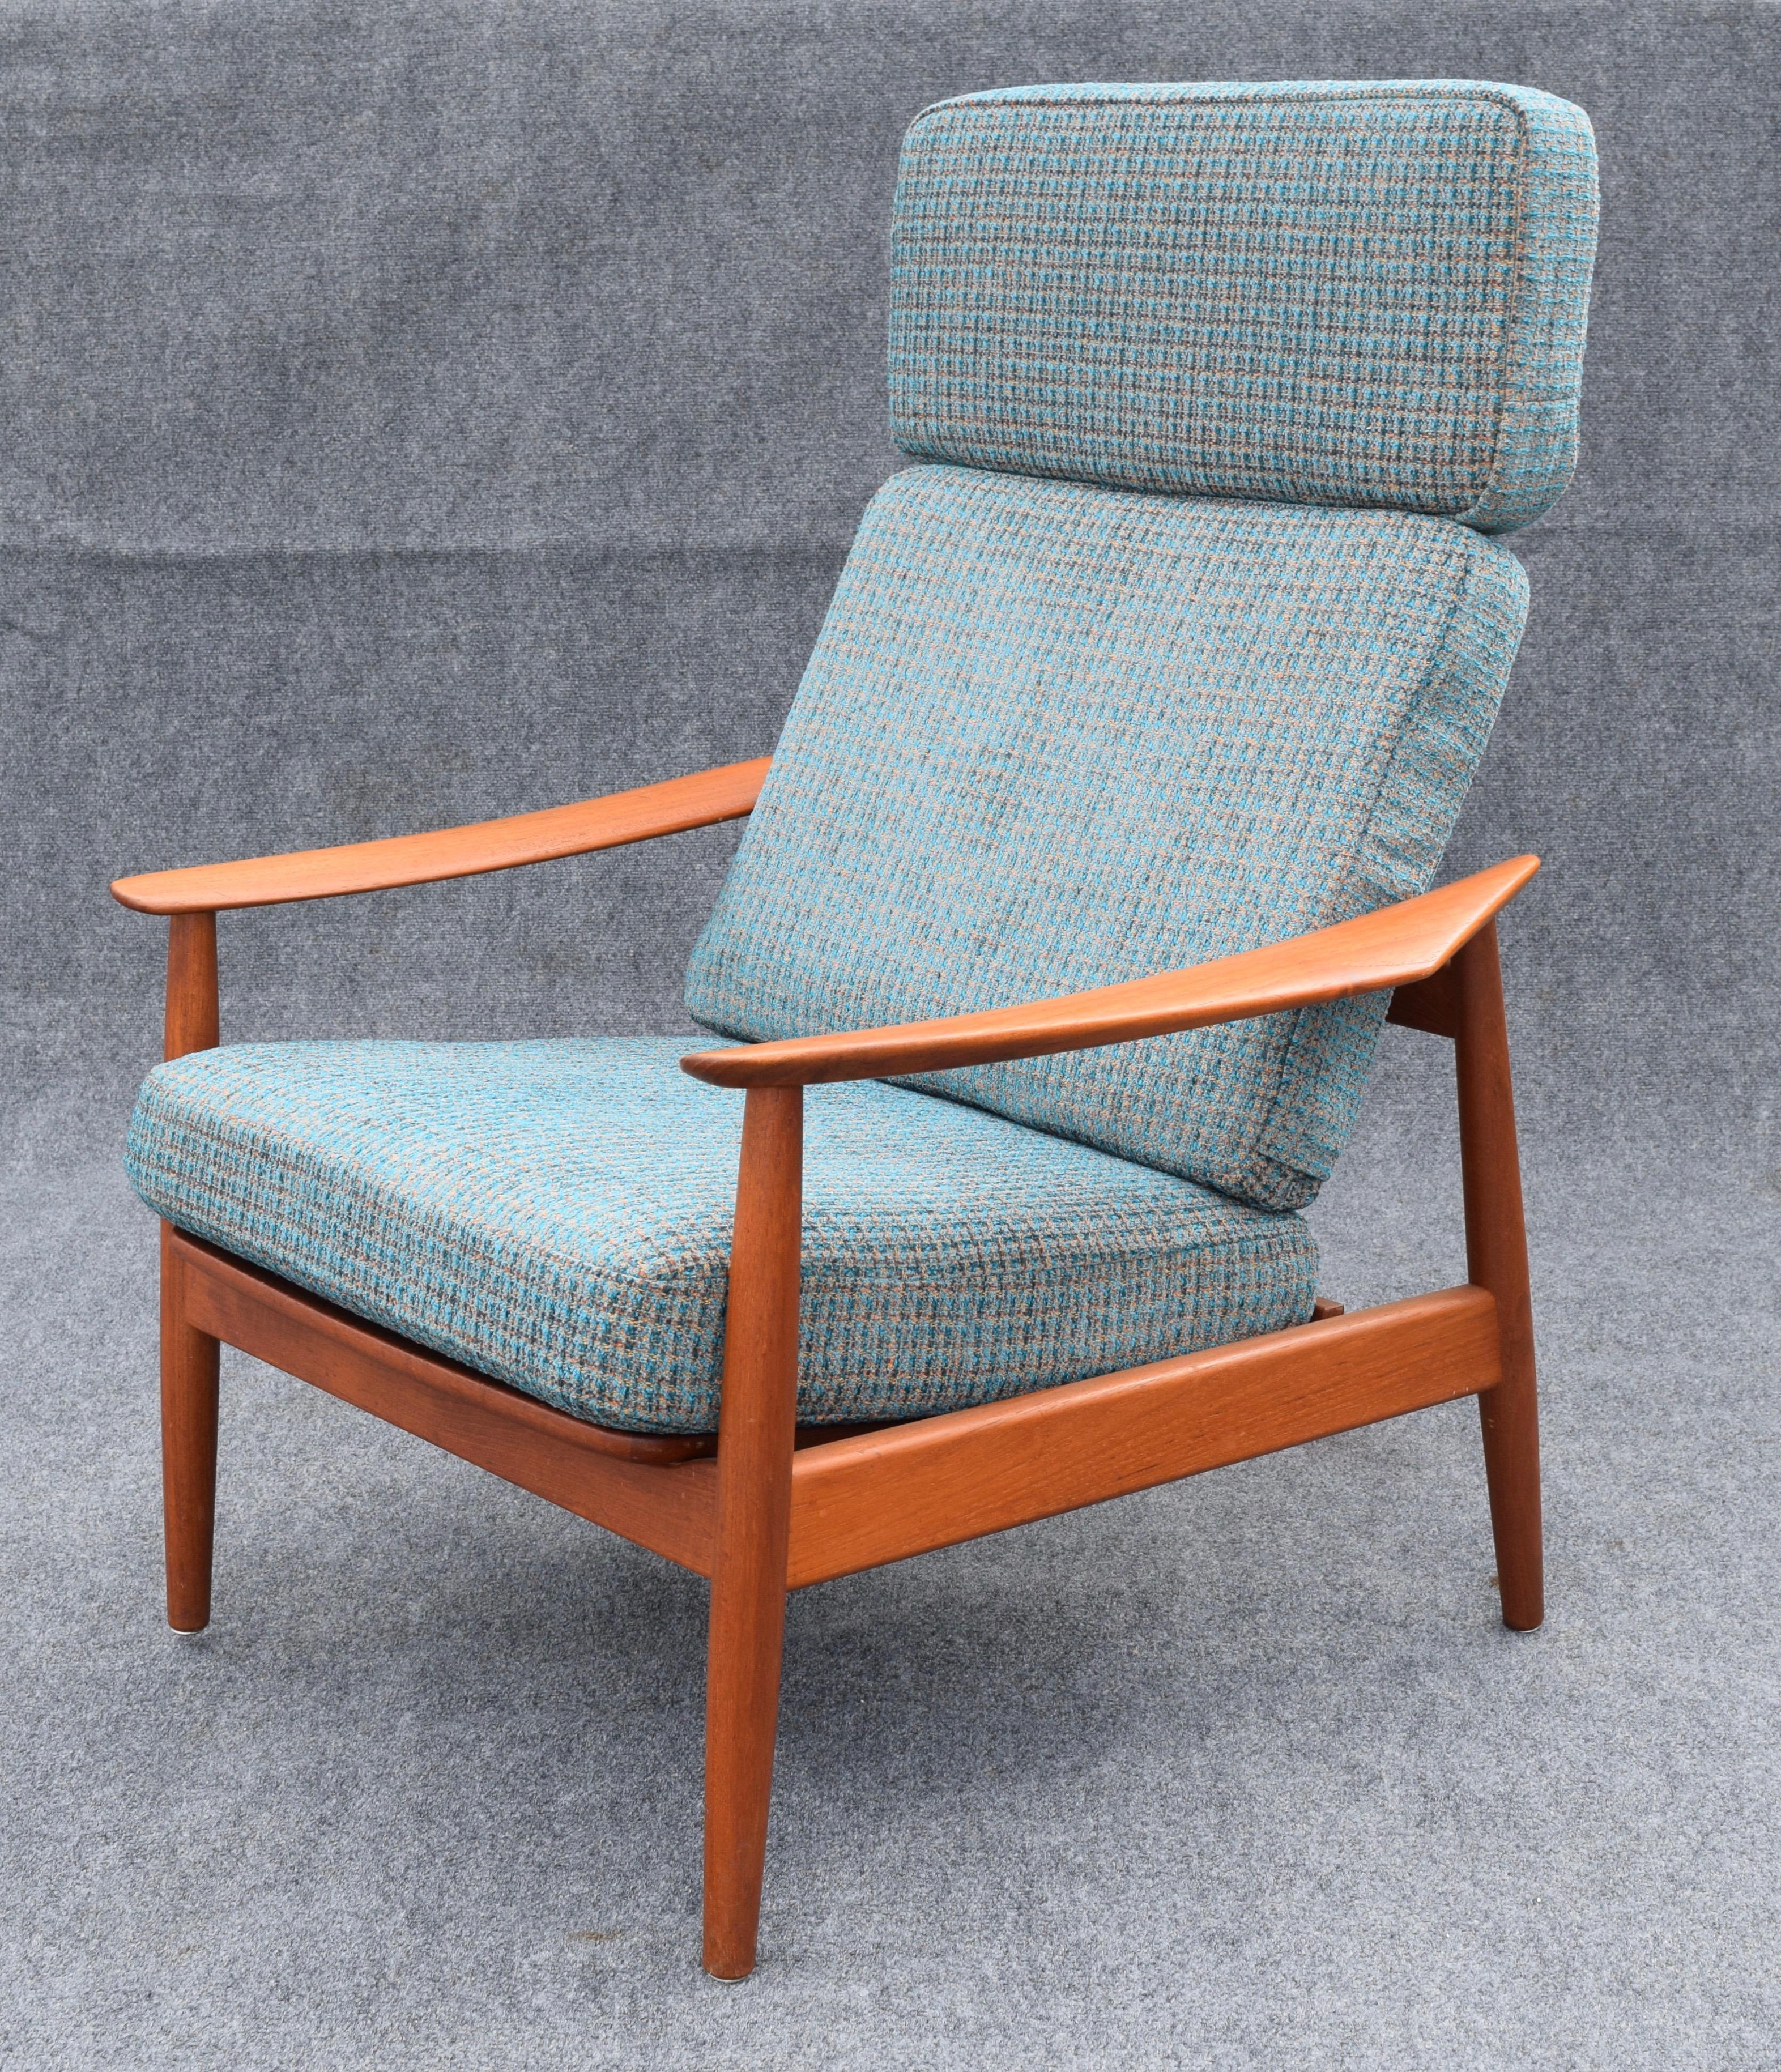 Vintage Arne Vodder for Cado Danish Modern Teak Recliner Chair - Image 2 of 10  sc 1 st  Chairish & Vintage Arne Vodder for Cado Danish Modern Teak Recliner Chair ... islam-shia.org